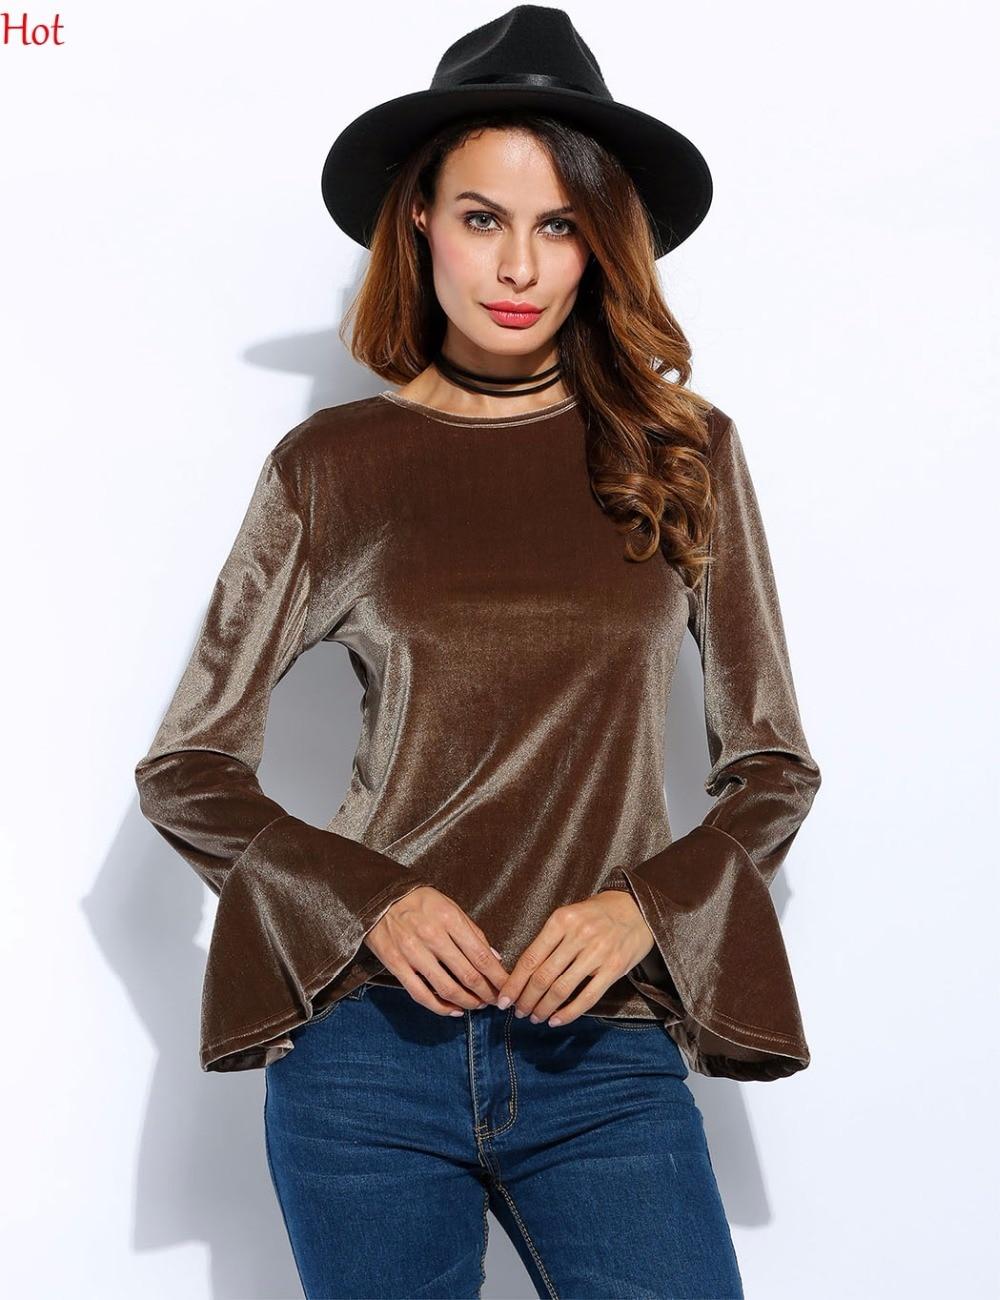 Women Velvet T Shirt Vintage Vintage Style Round